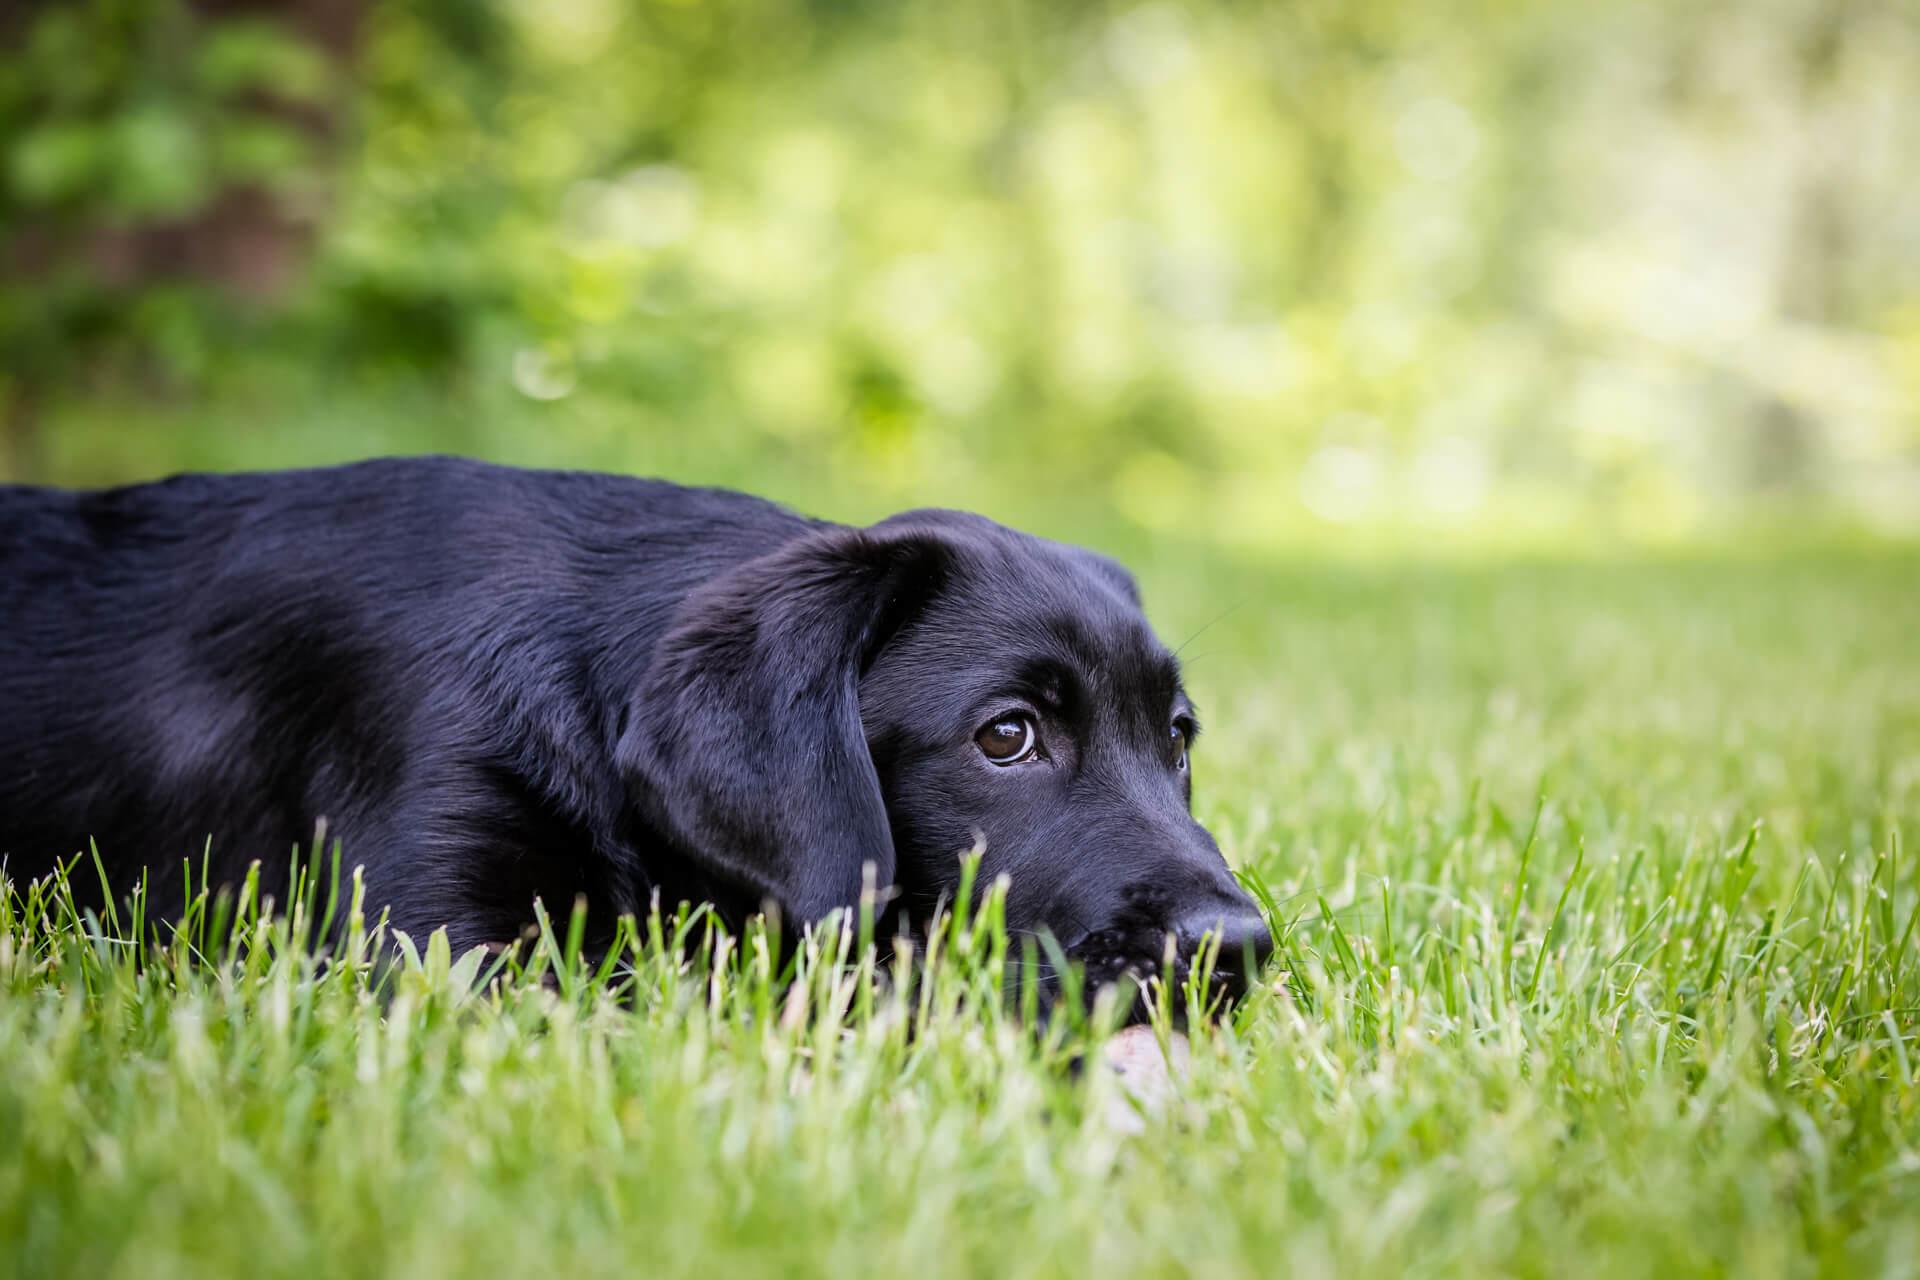 labrador puppy lying in the grass